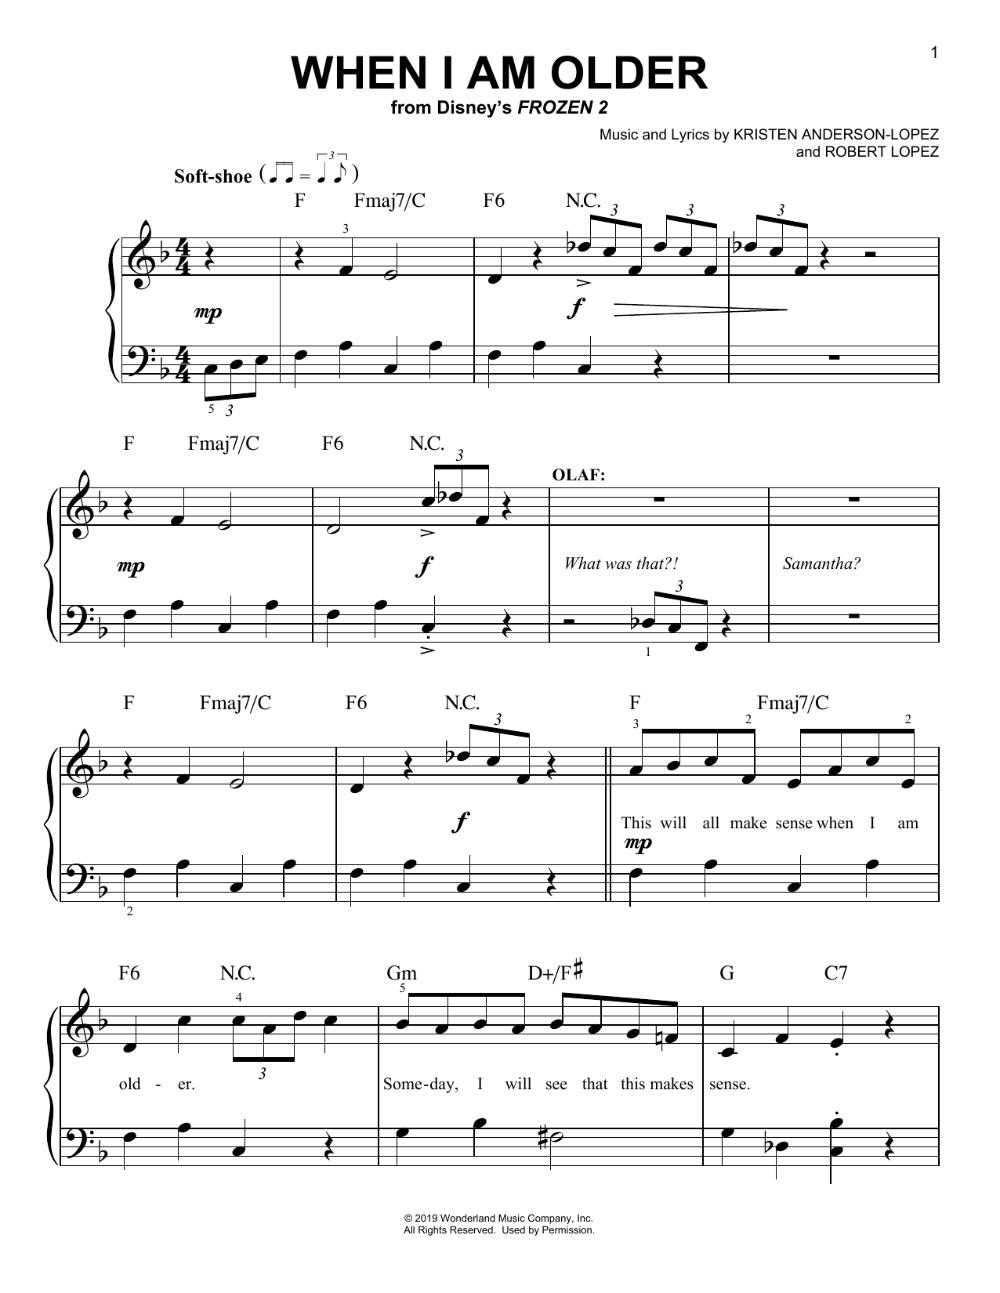 Josh Gad When I Am Older From Disney S Frozen 2 Sheet Music Notes Chords Score Download Printable Pdf Disney Sheet Music Sheet Music Notes Old Sheet Music